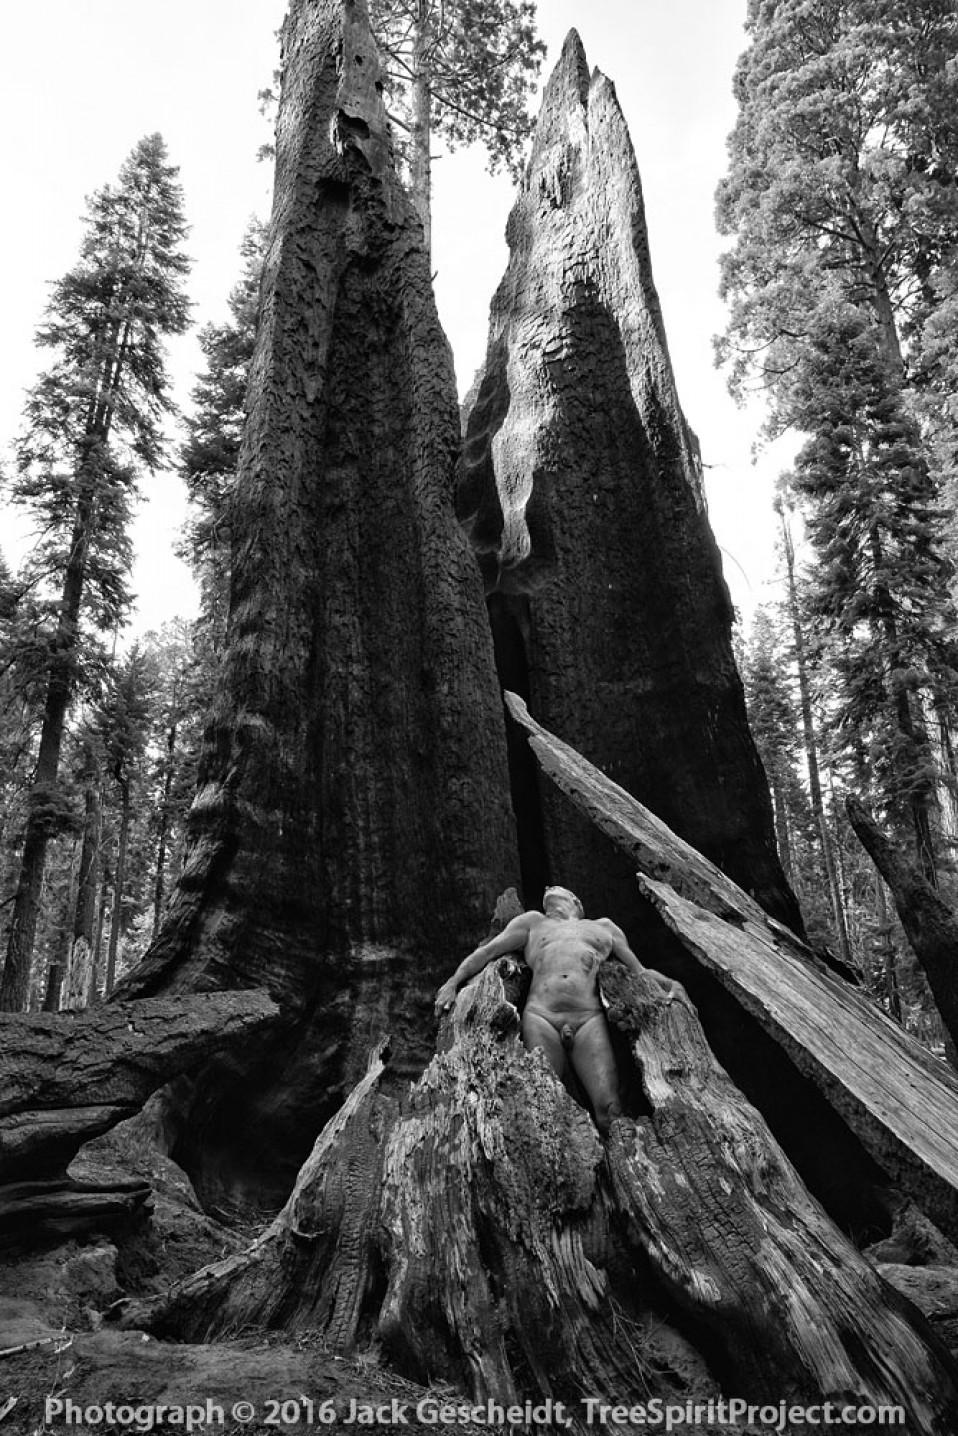 Prometheus-Treespirit-Project-5187-1000p-WEB